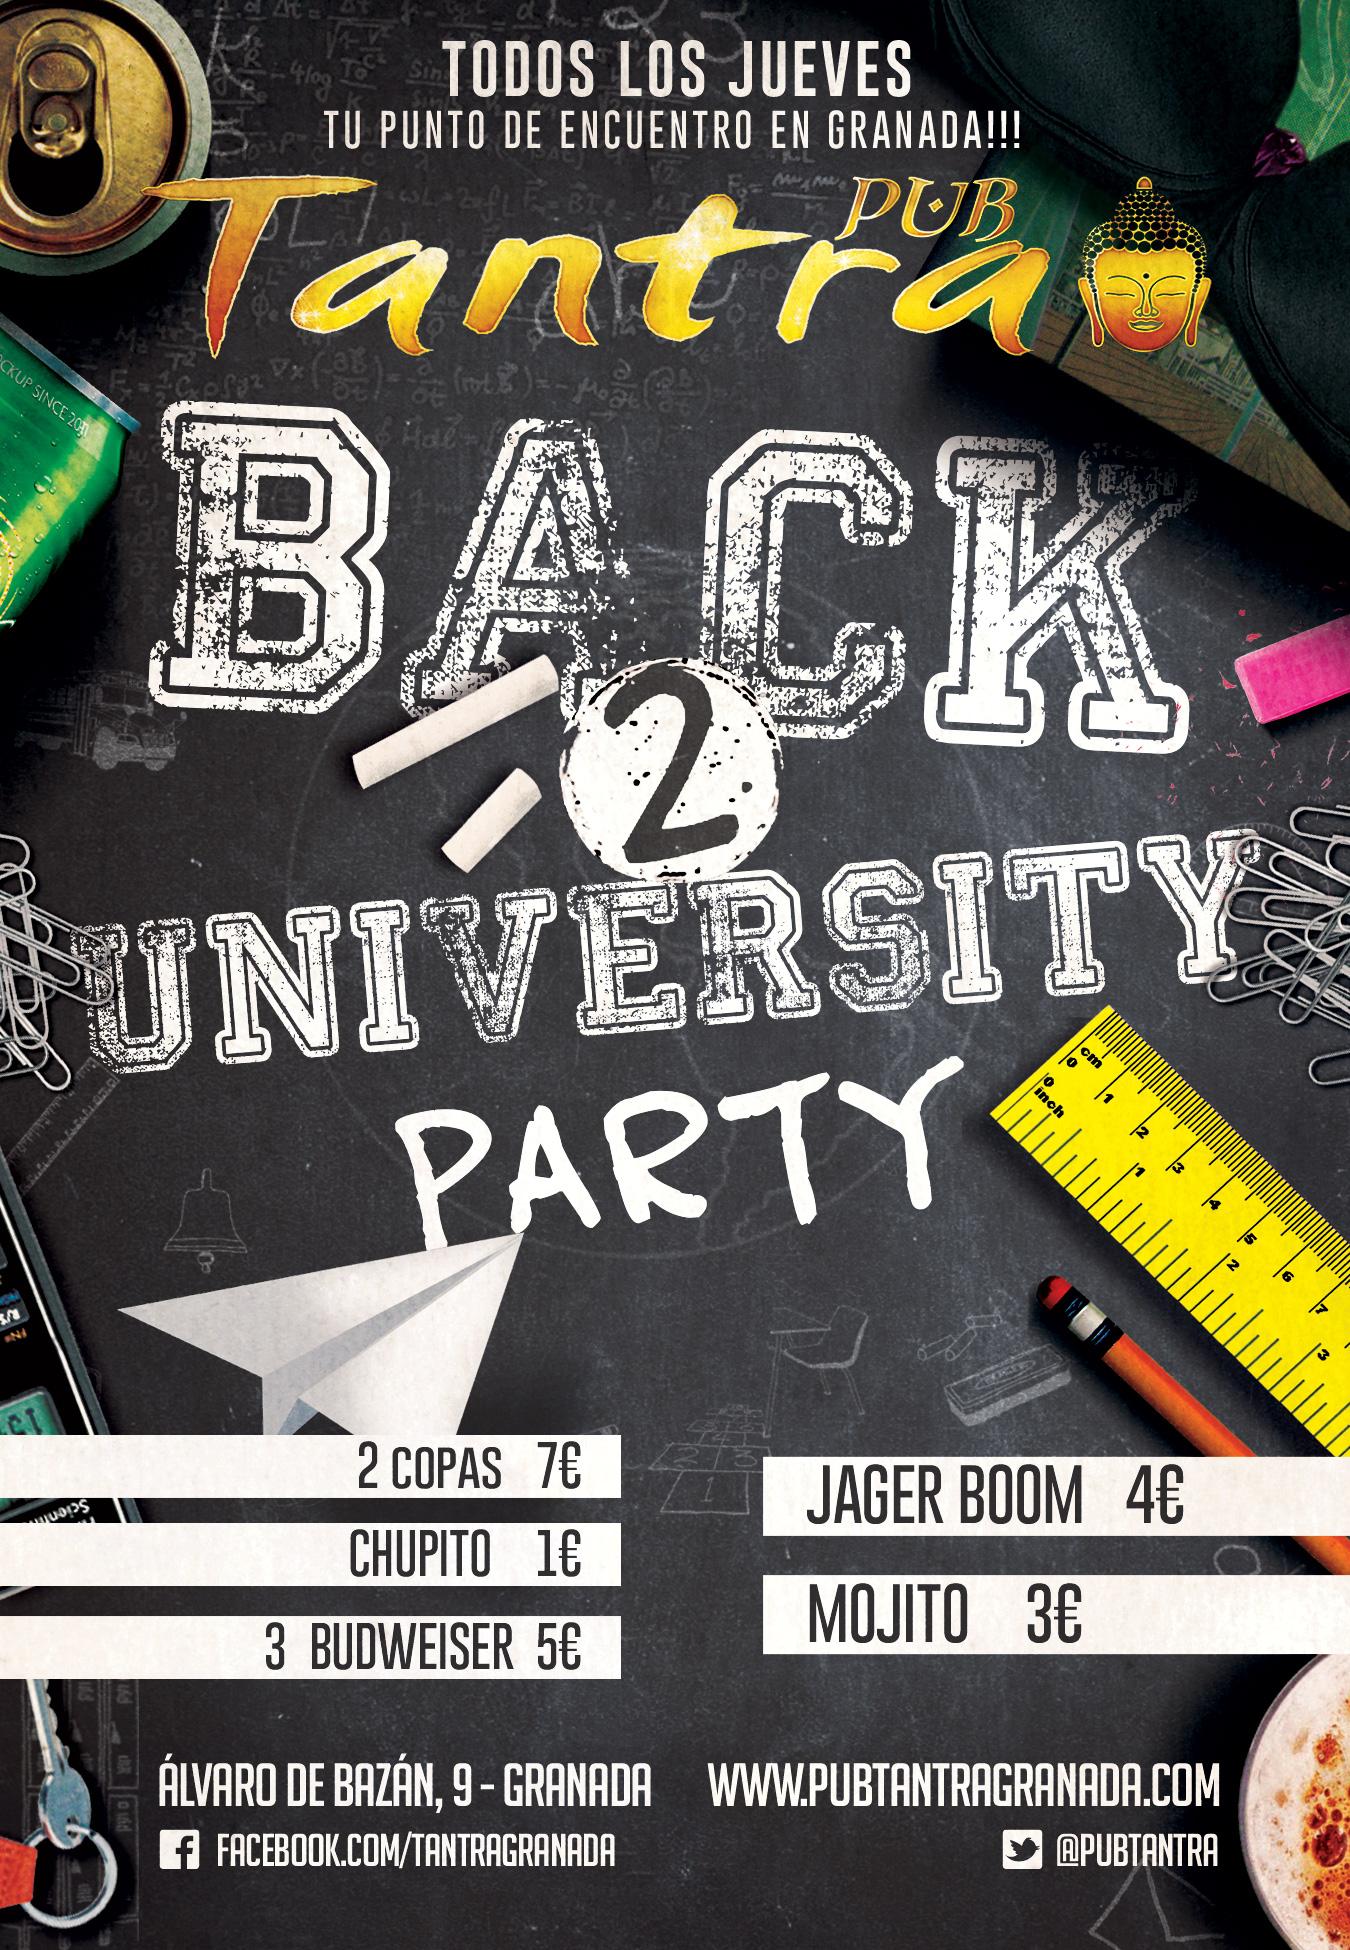 Back to University Party